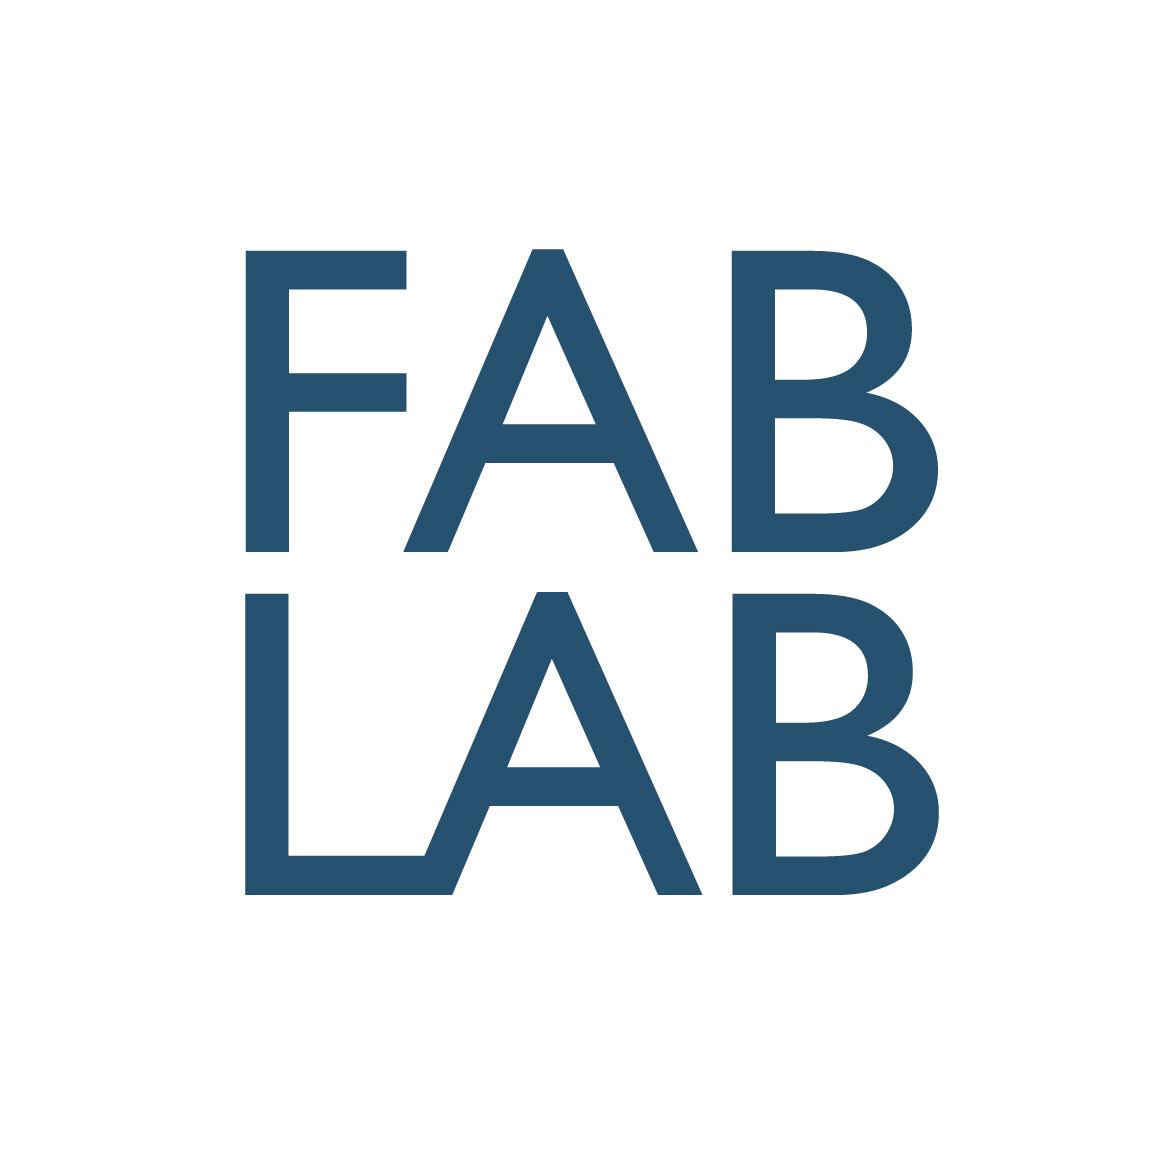 Fablab AB